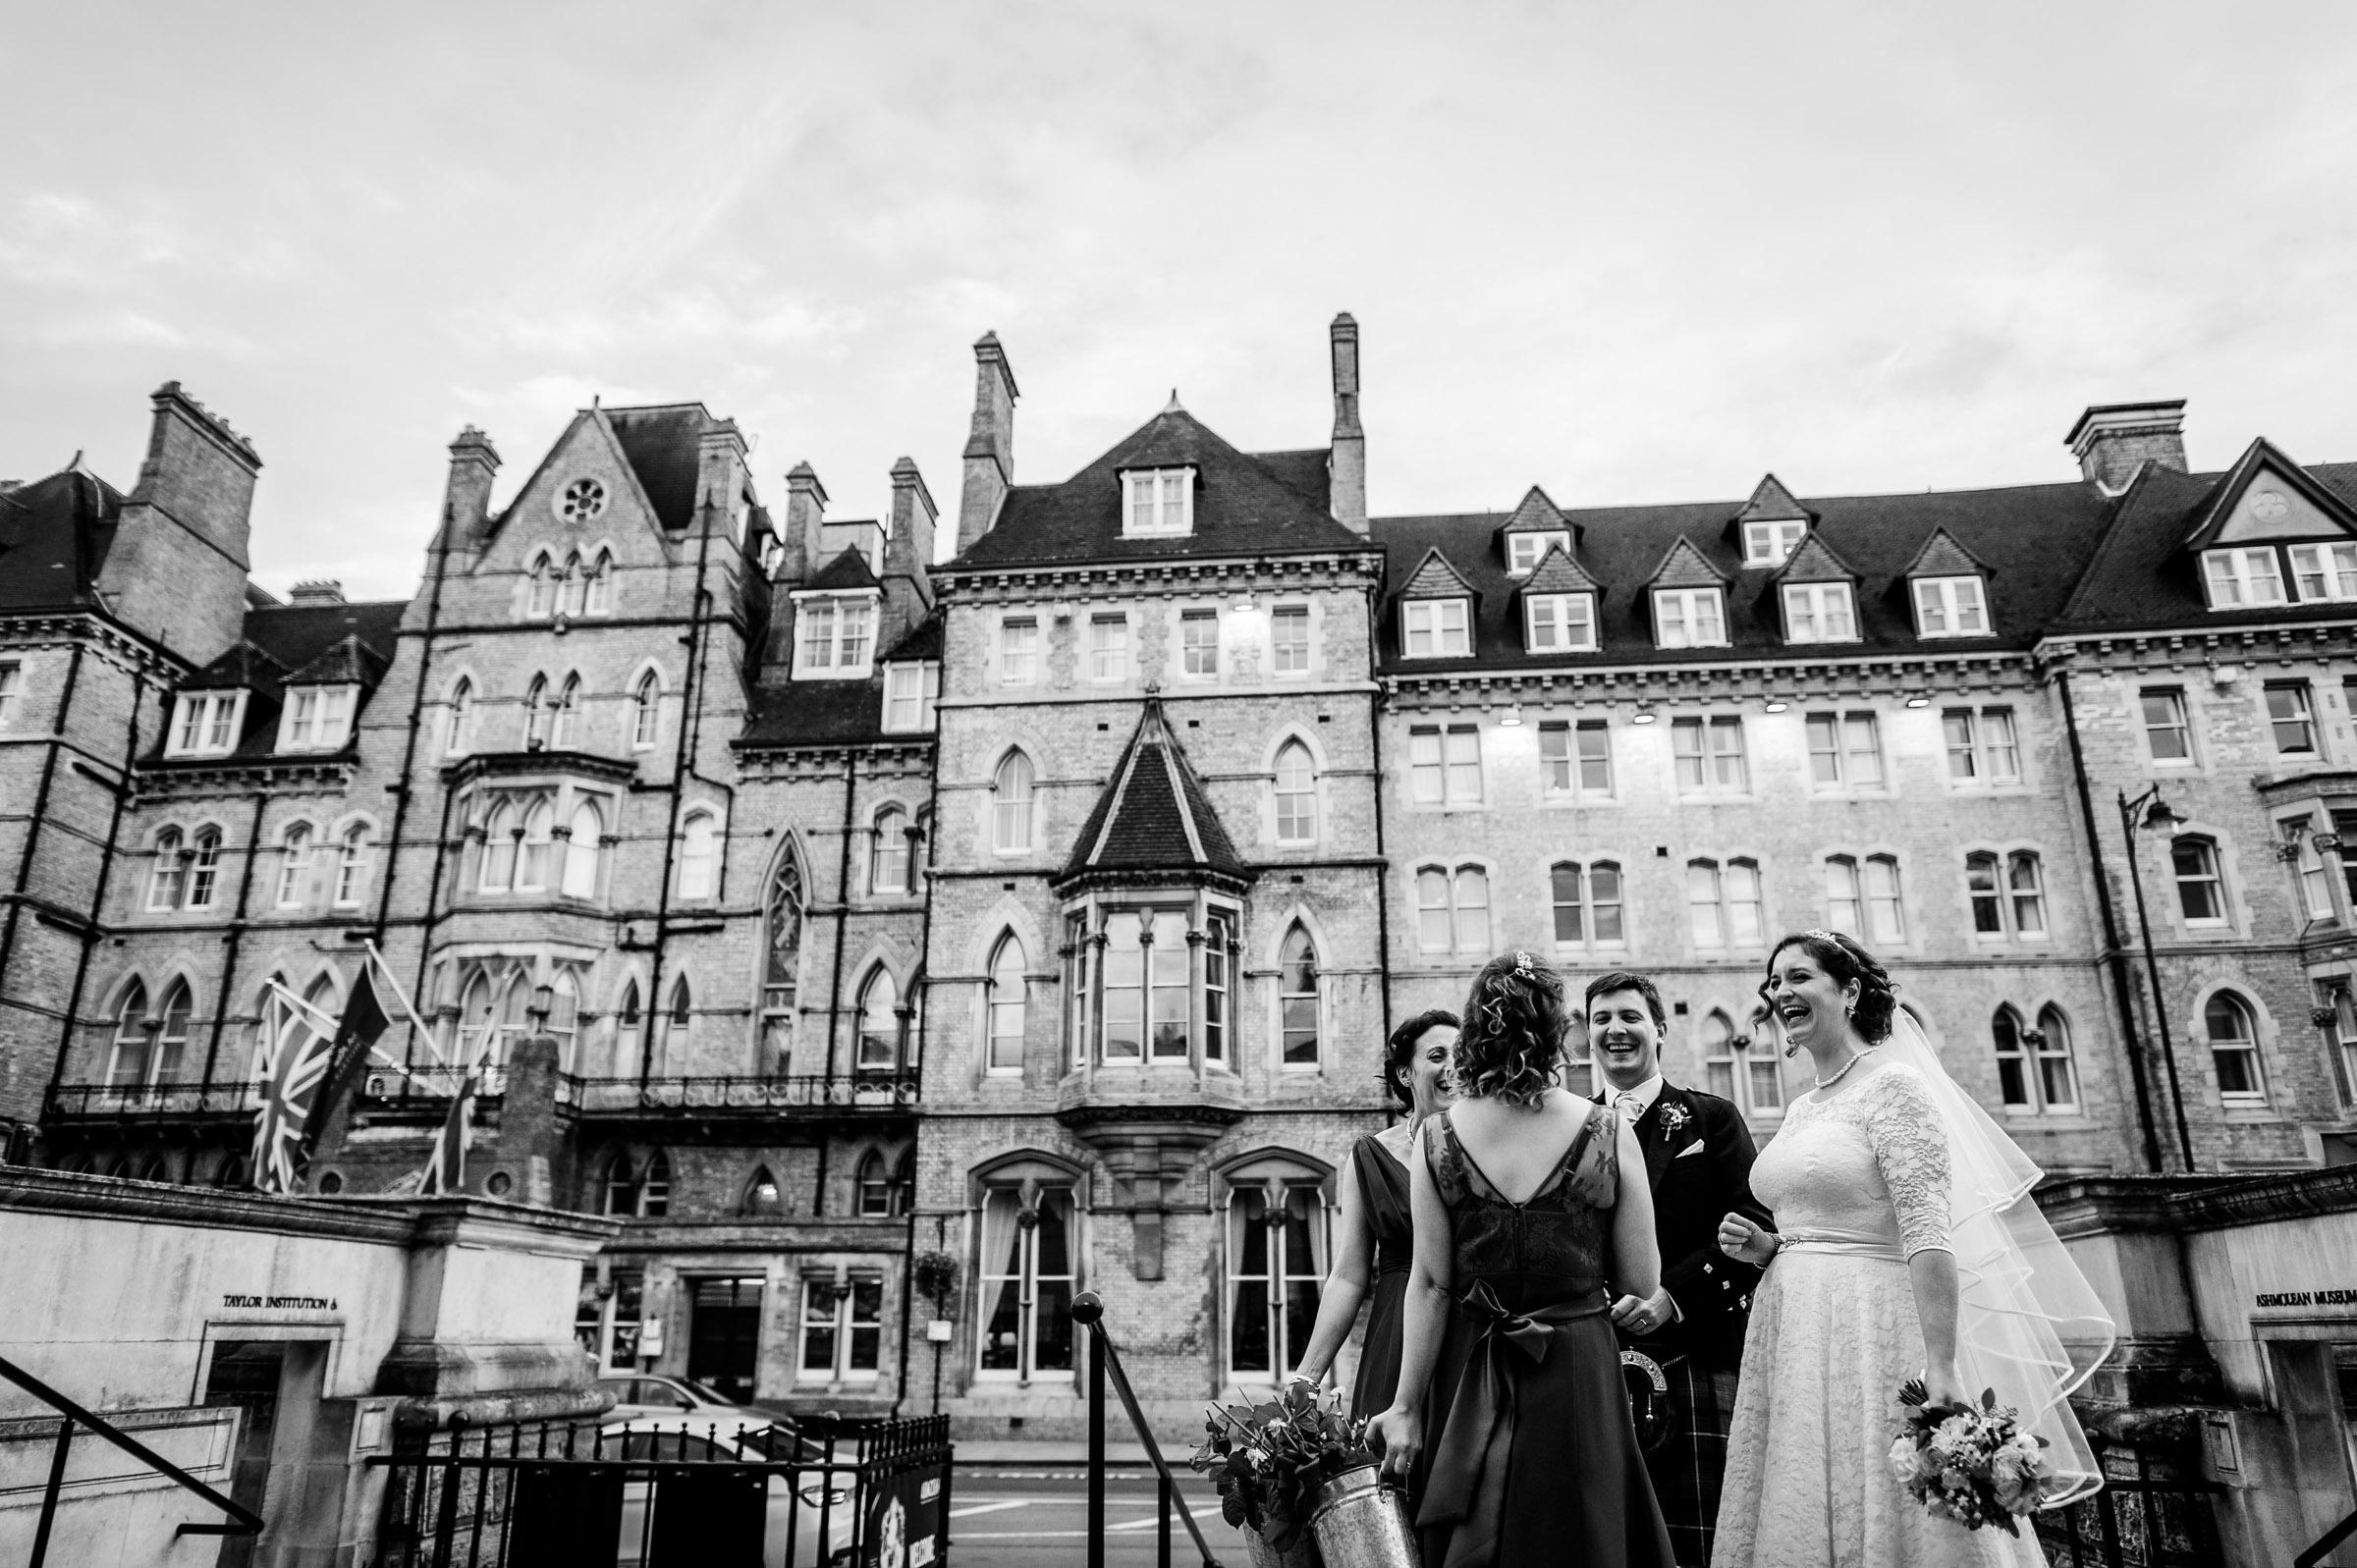 Ashmolean-Museum-Wedding-Pictures-0047.jpg